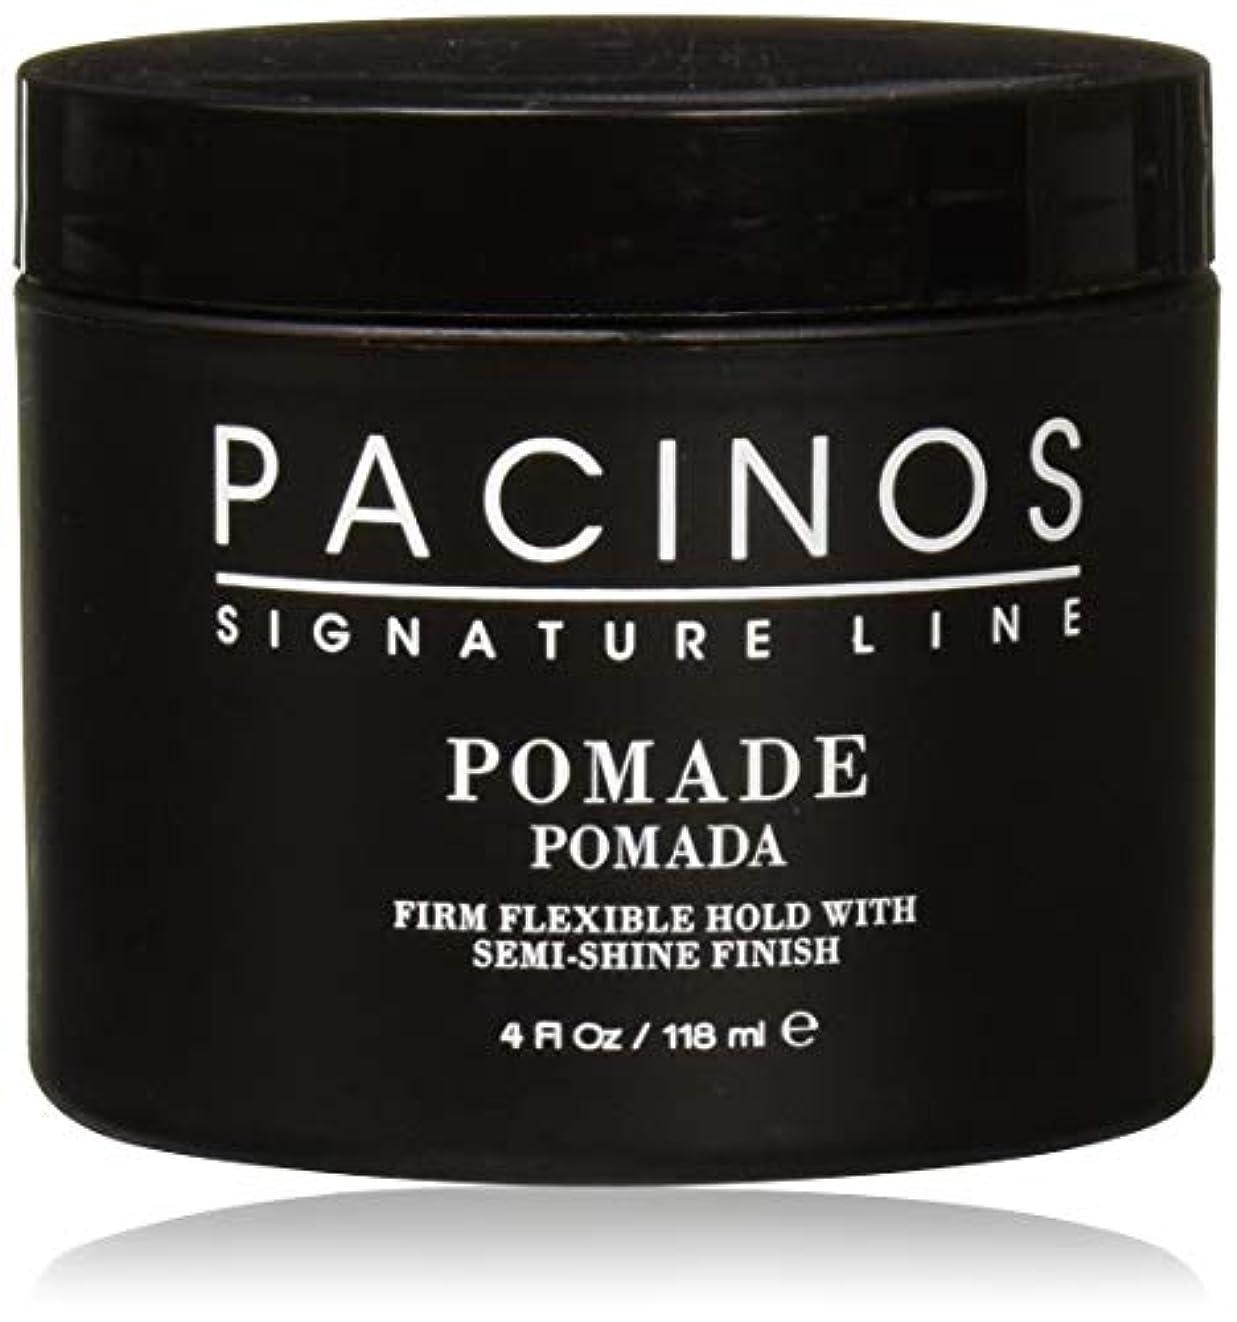 Pacinos Pomade パチーノス?ポマード【日本正規品】4oz(118g)